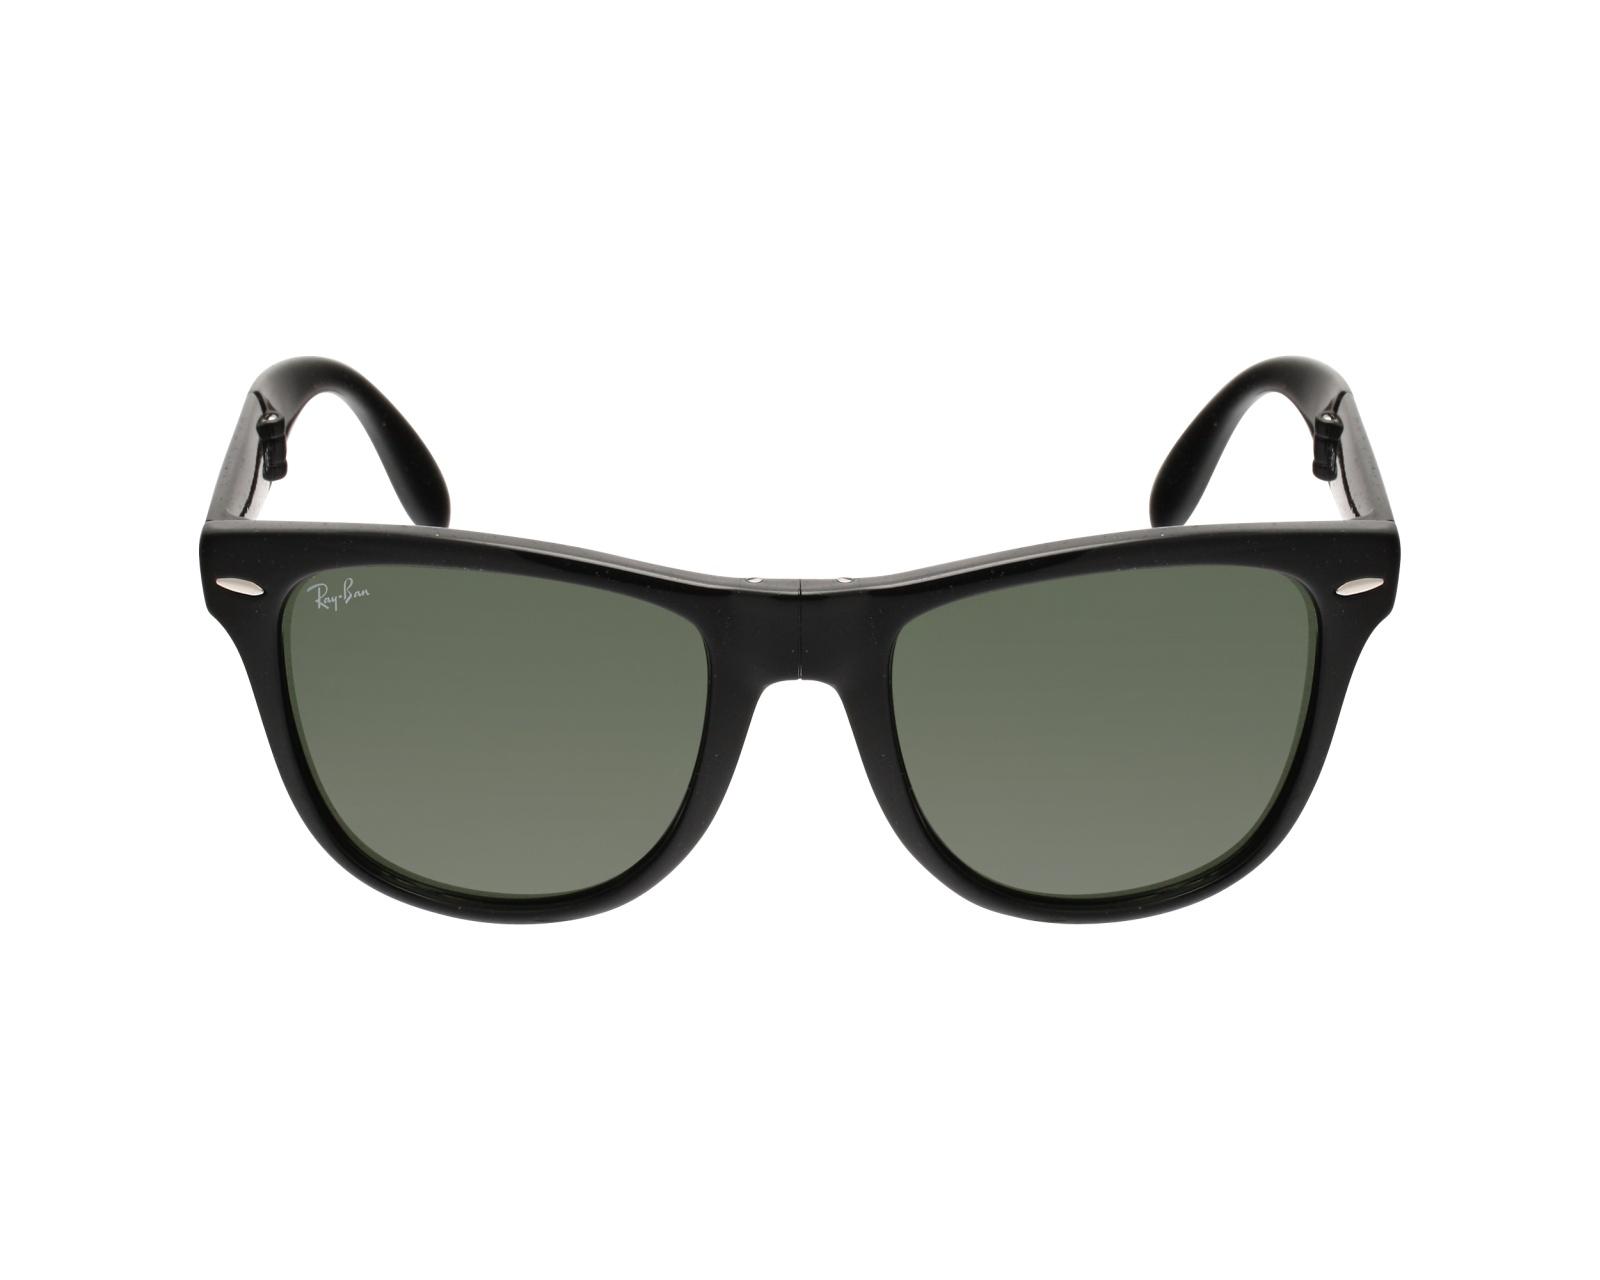 aec51de6eff00 Gafas de Sol Ray-Ban Wayfarer Folding Classic RB-4105 601